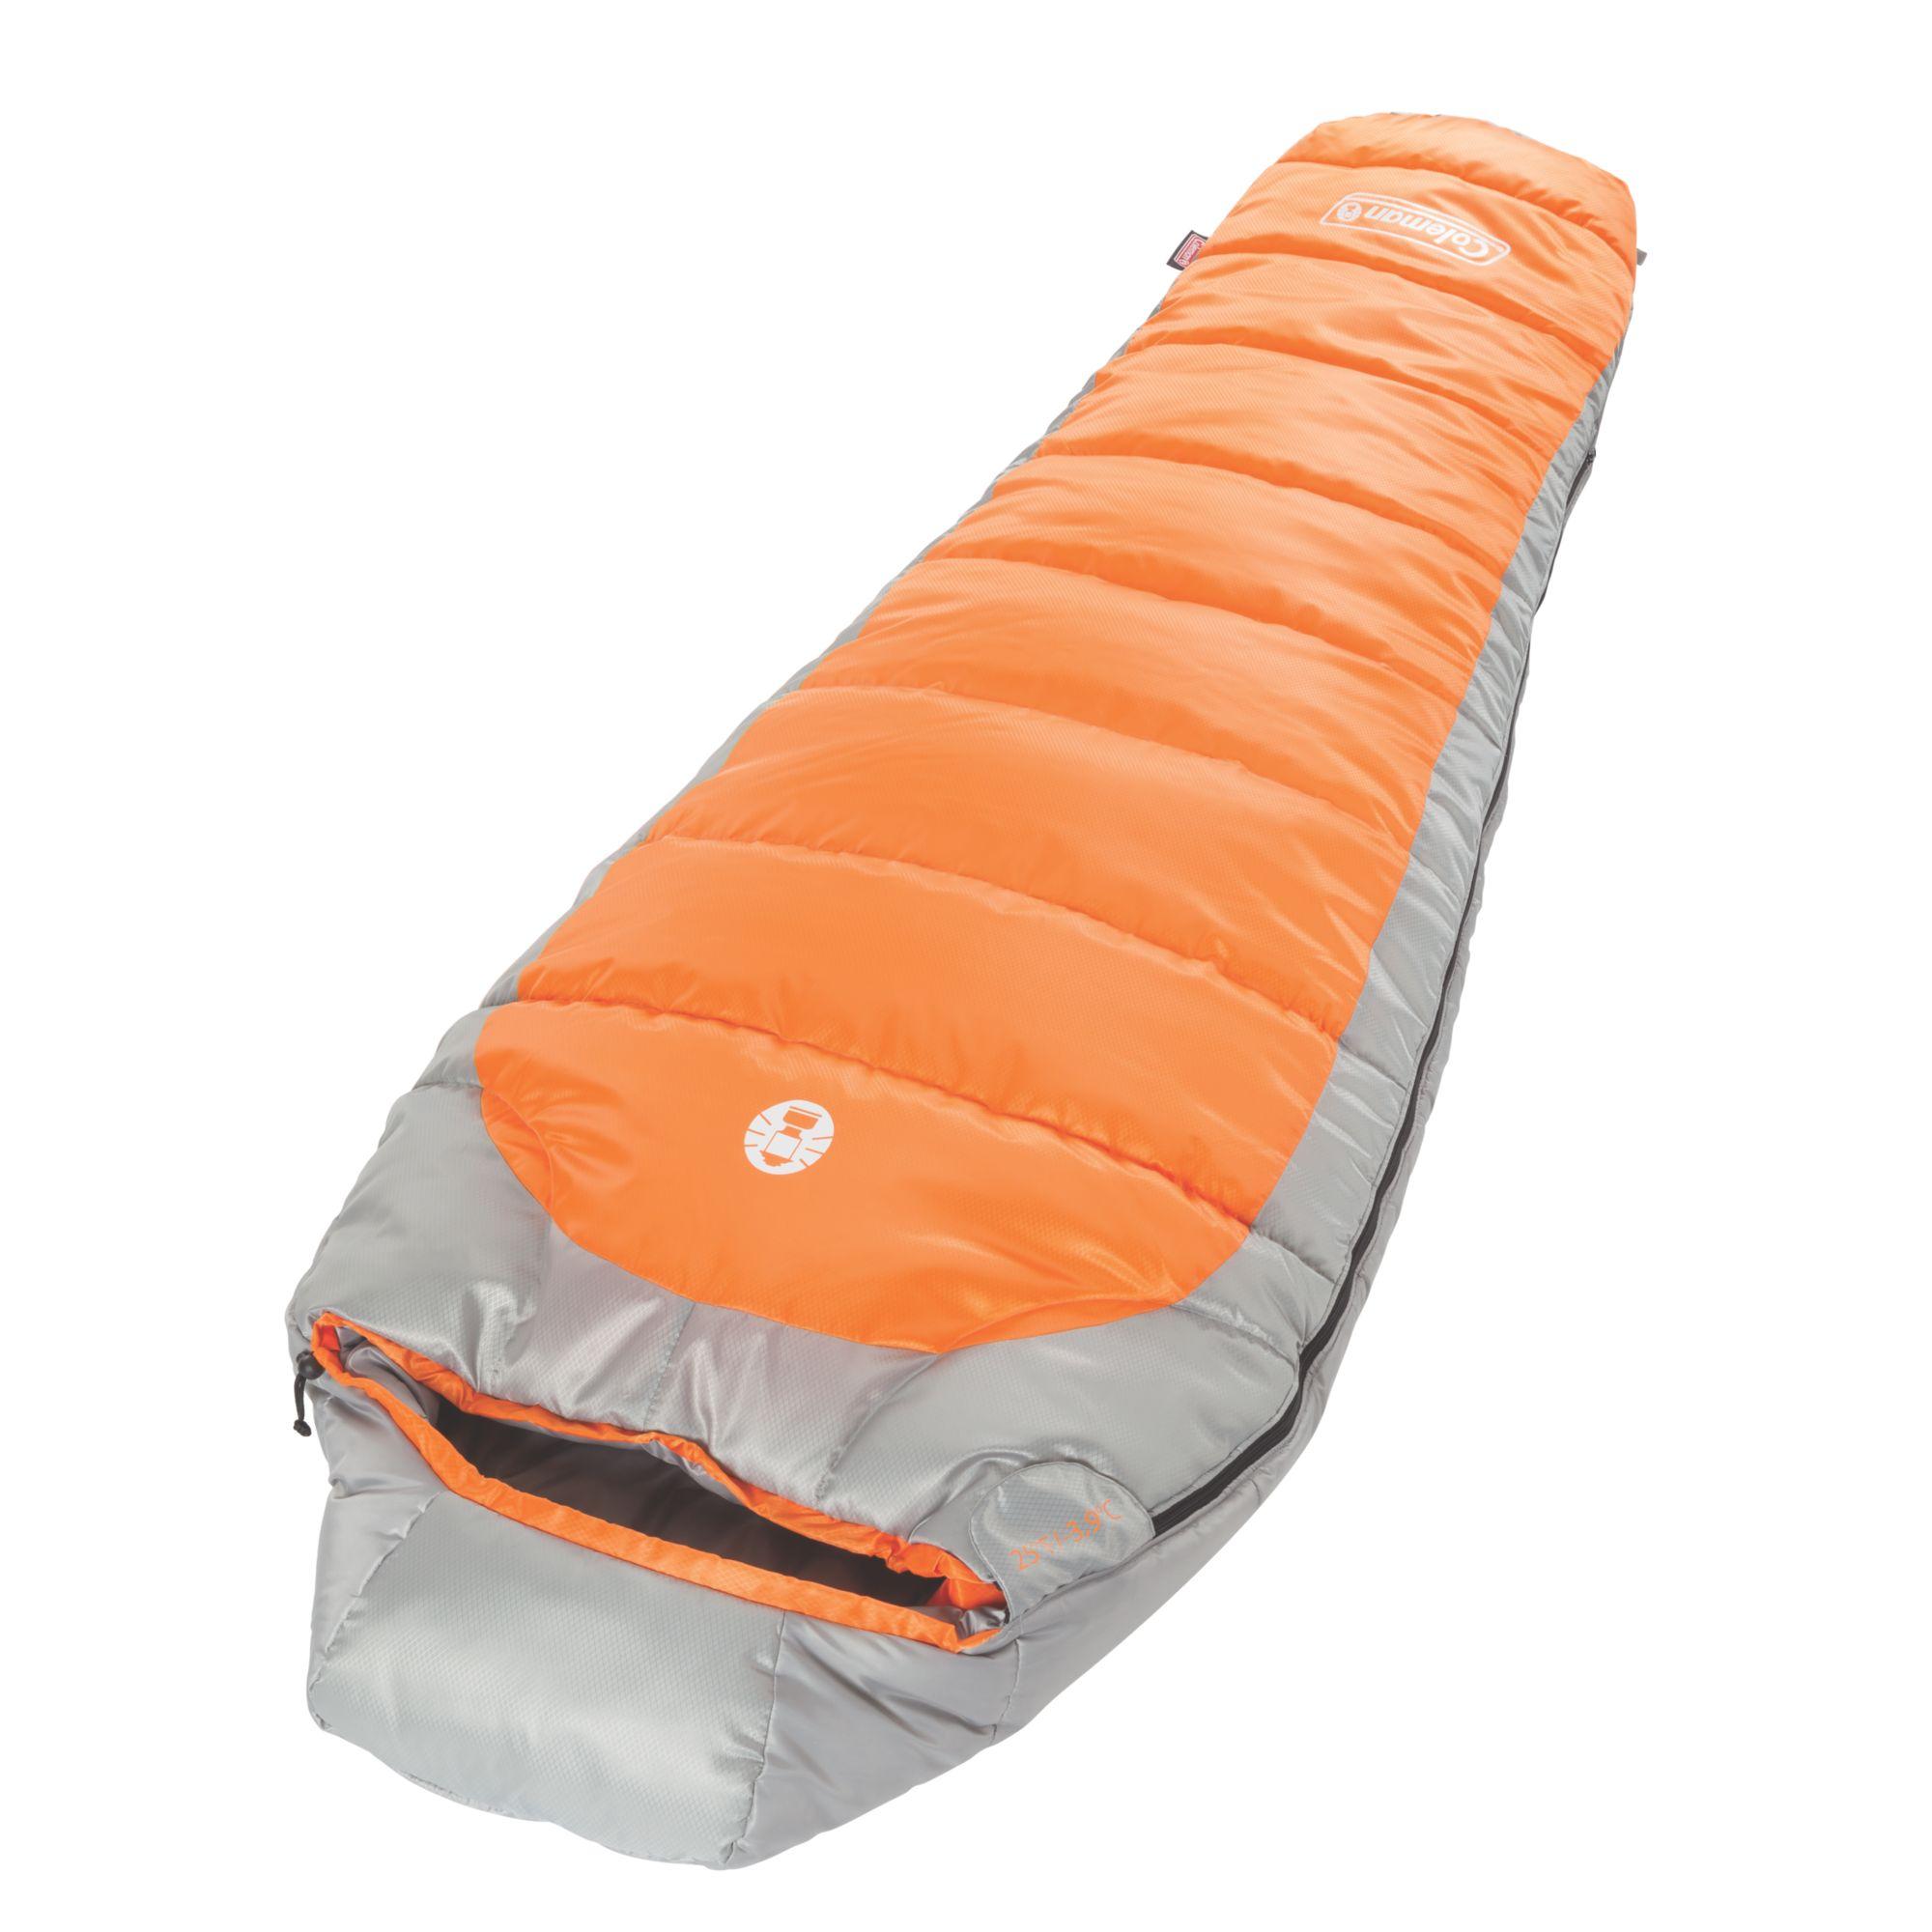 SilvertonTM 25 Tall Sleeping Bag